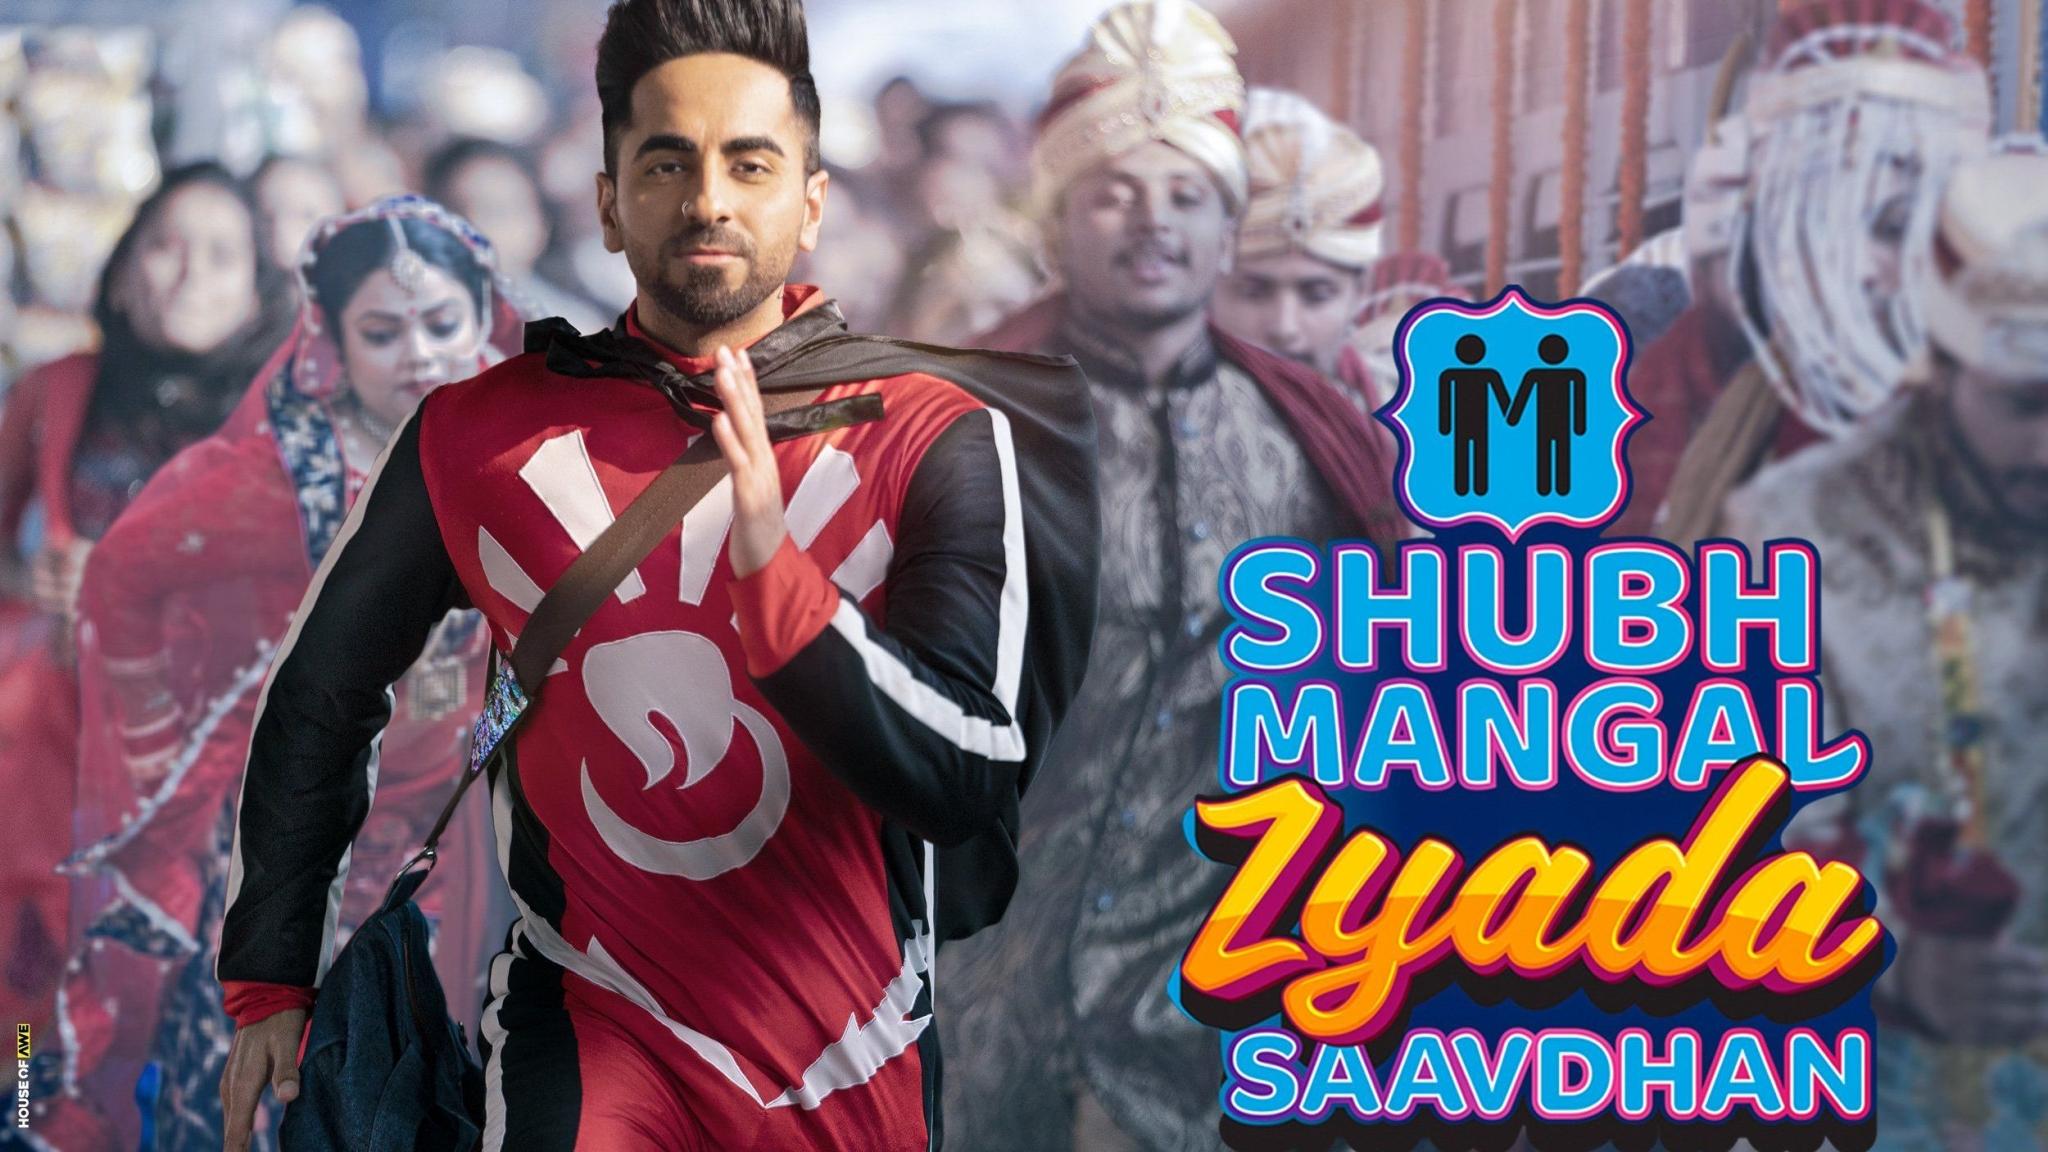 Ayushmann Races Towards 'Shubh Mangal Zyada Saavdhan' Release